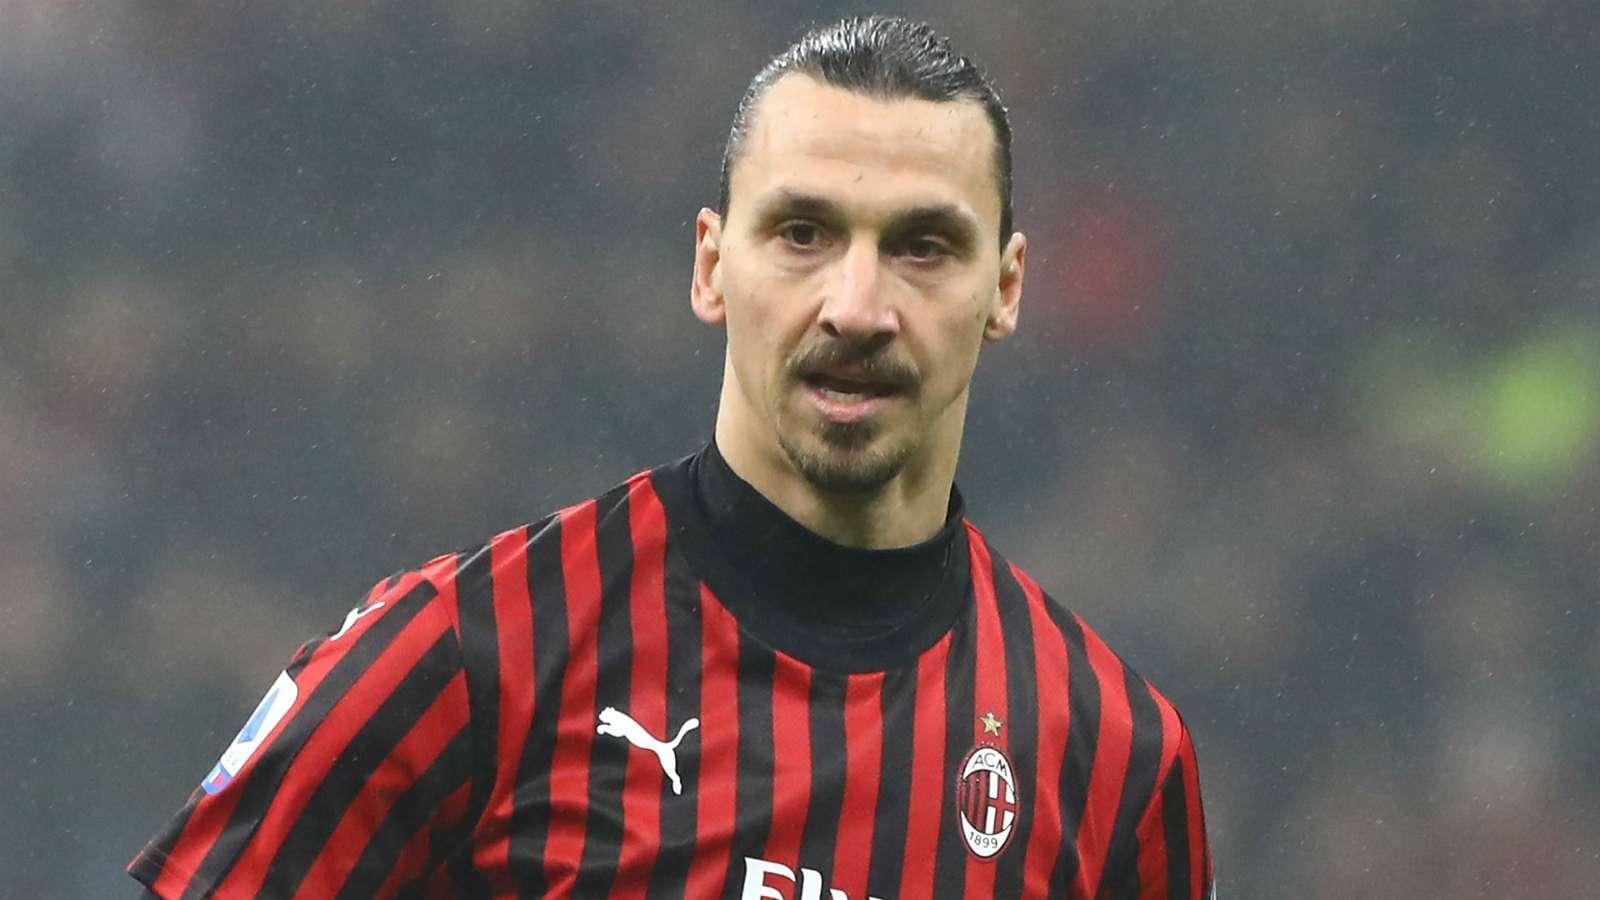 Zlatan Ibrahimovic Belum Ambil Keputusan Soal Masa Depan Di AC Milan